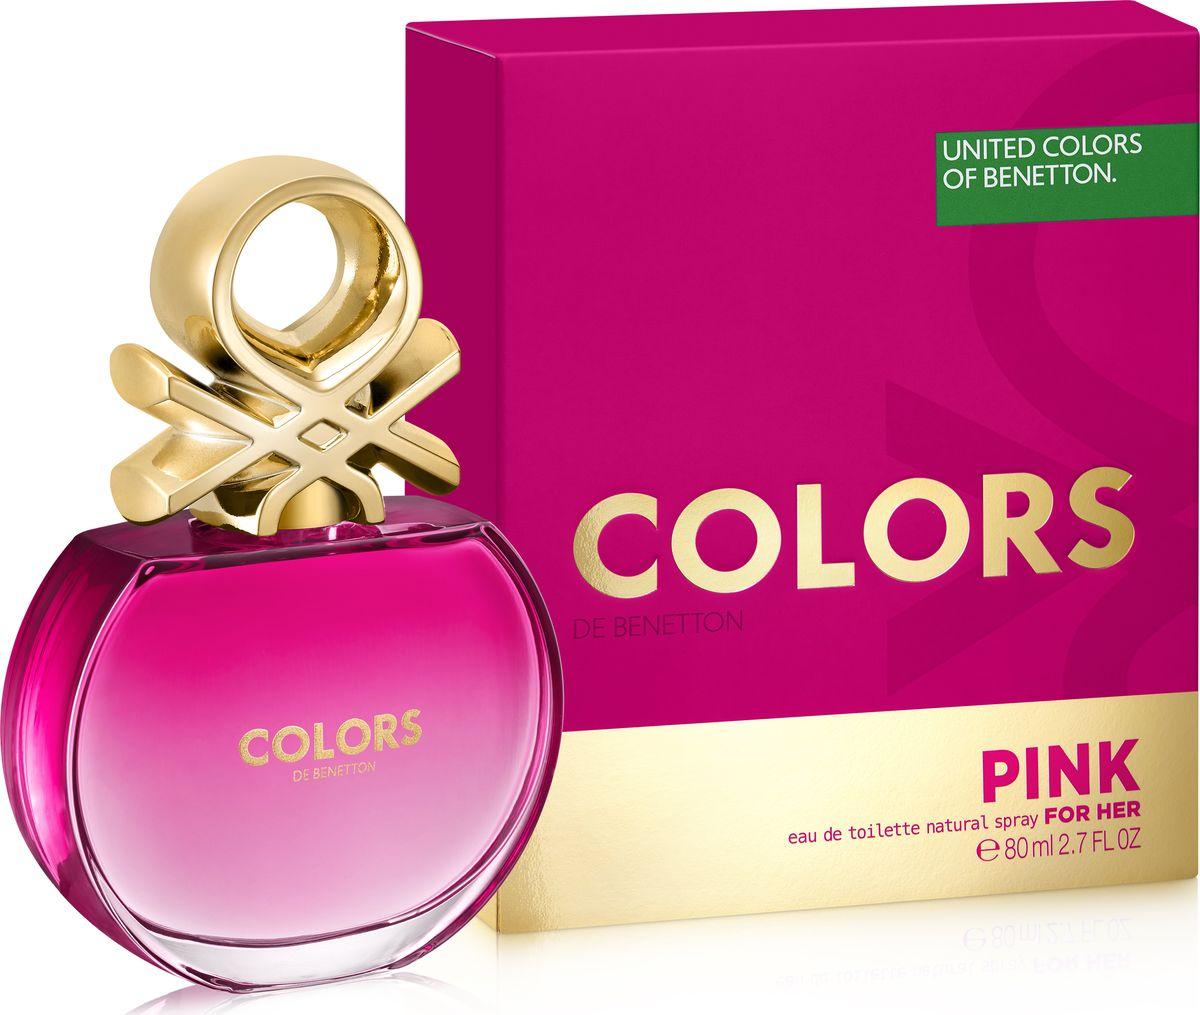 Benetton Colors Pink Туалетная вода женская 80 мл туалетная вода united colors of benetton туалетная вода benetton ud aim high 60 мл